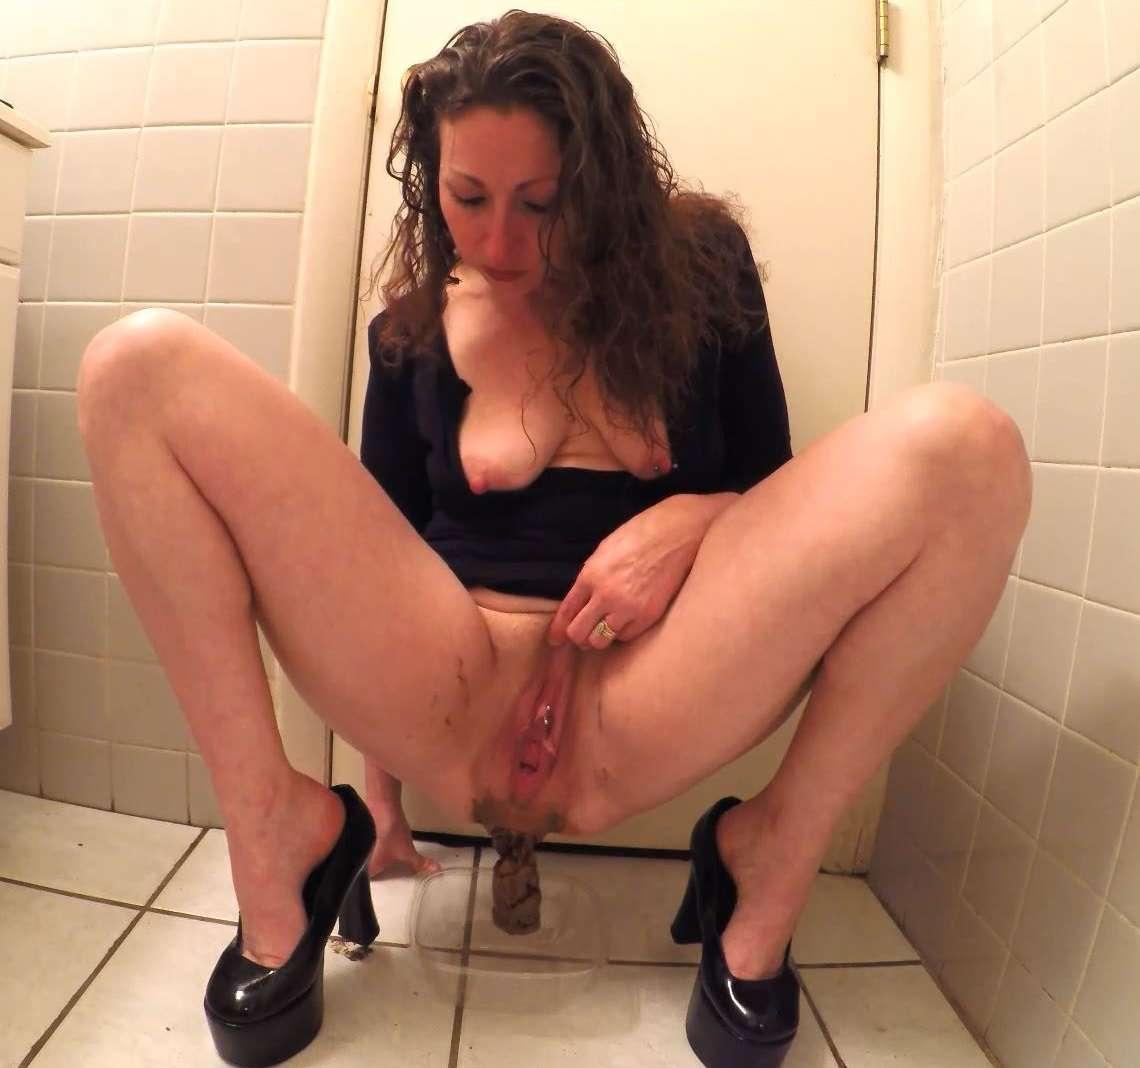 Naked girl pooping and vaping